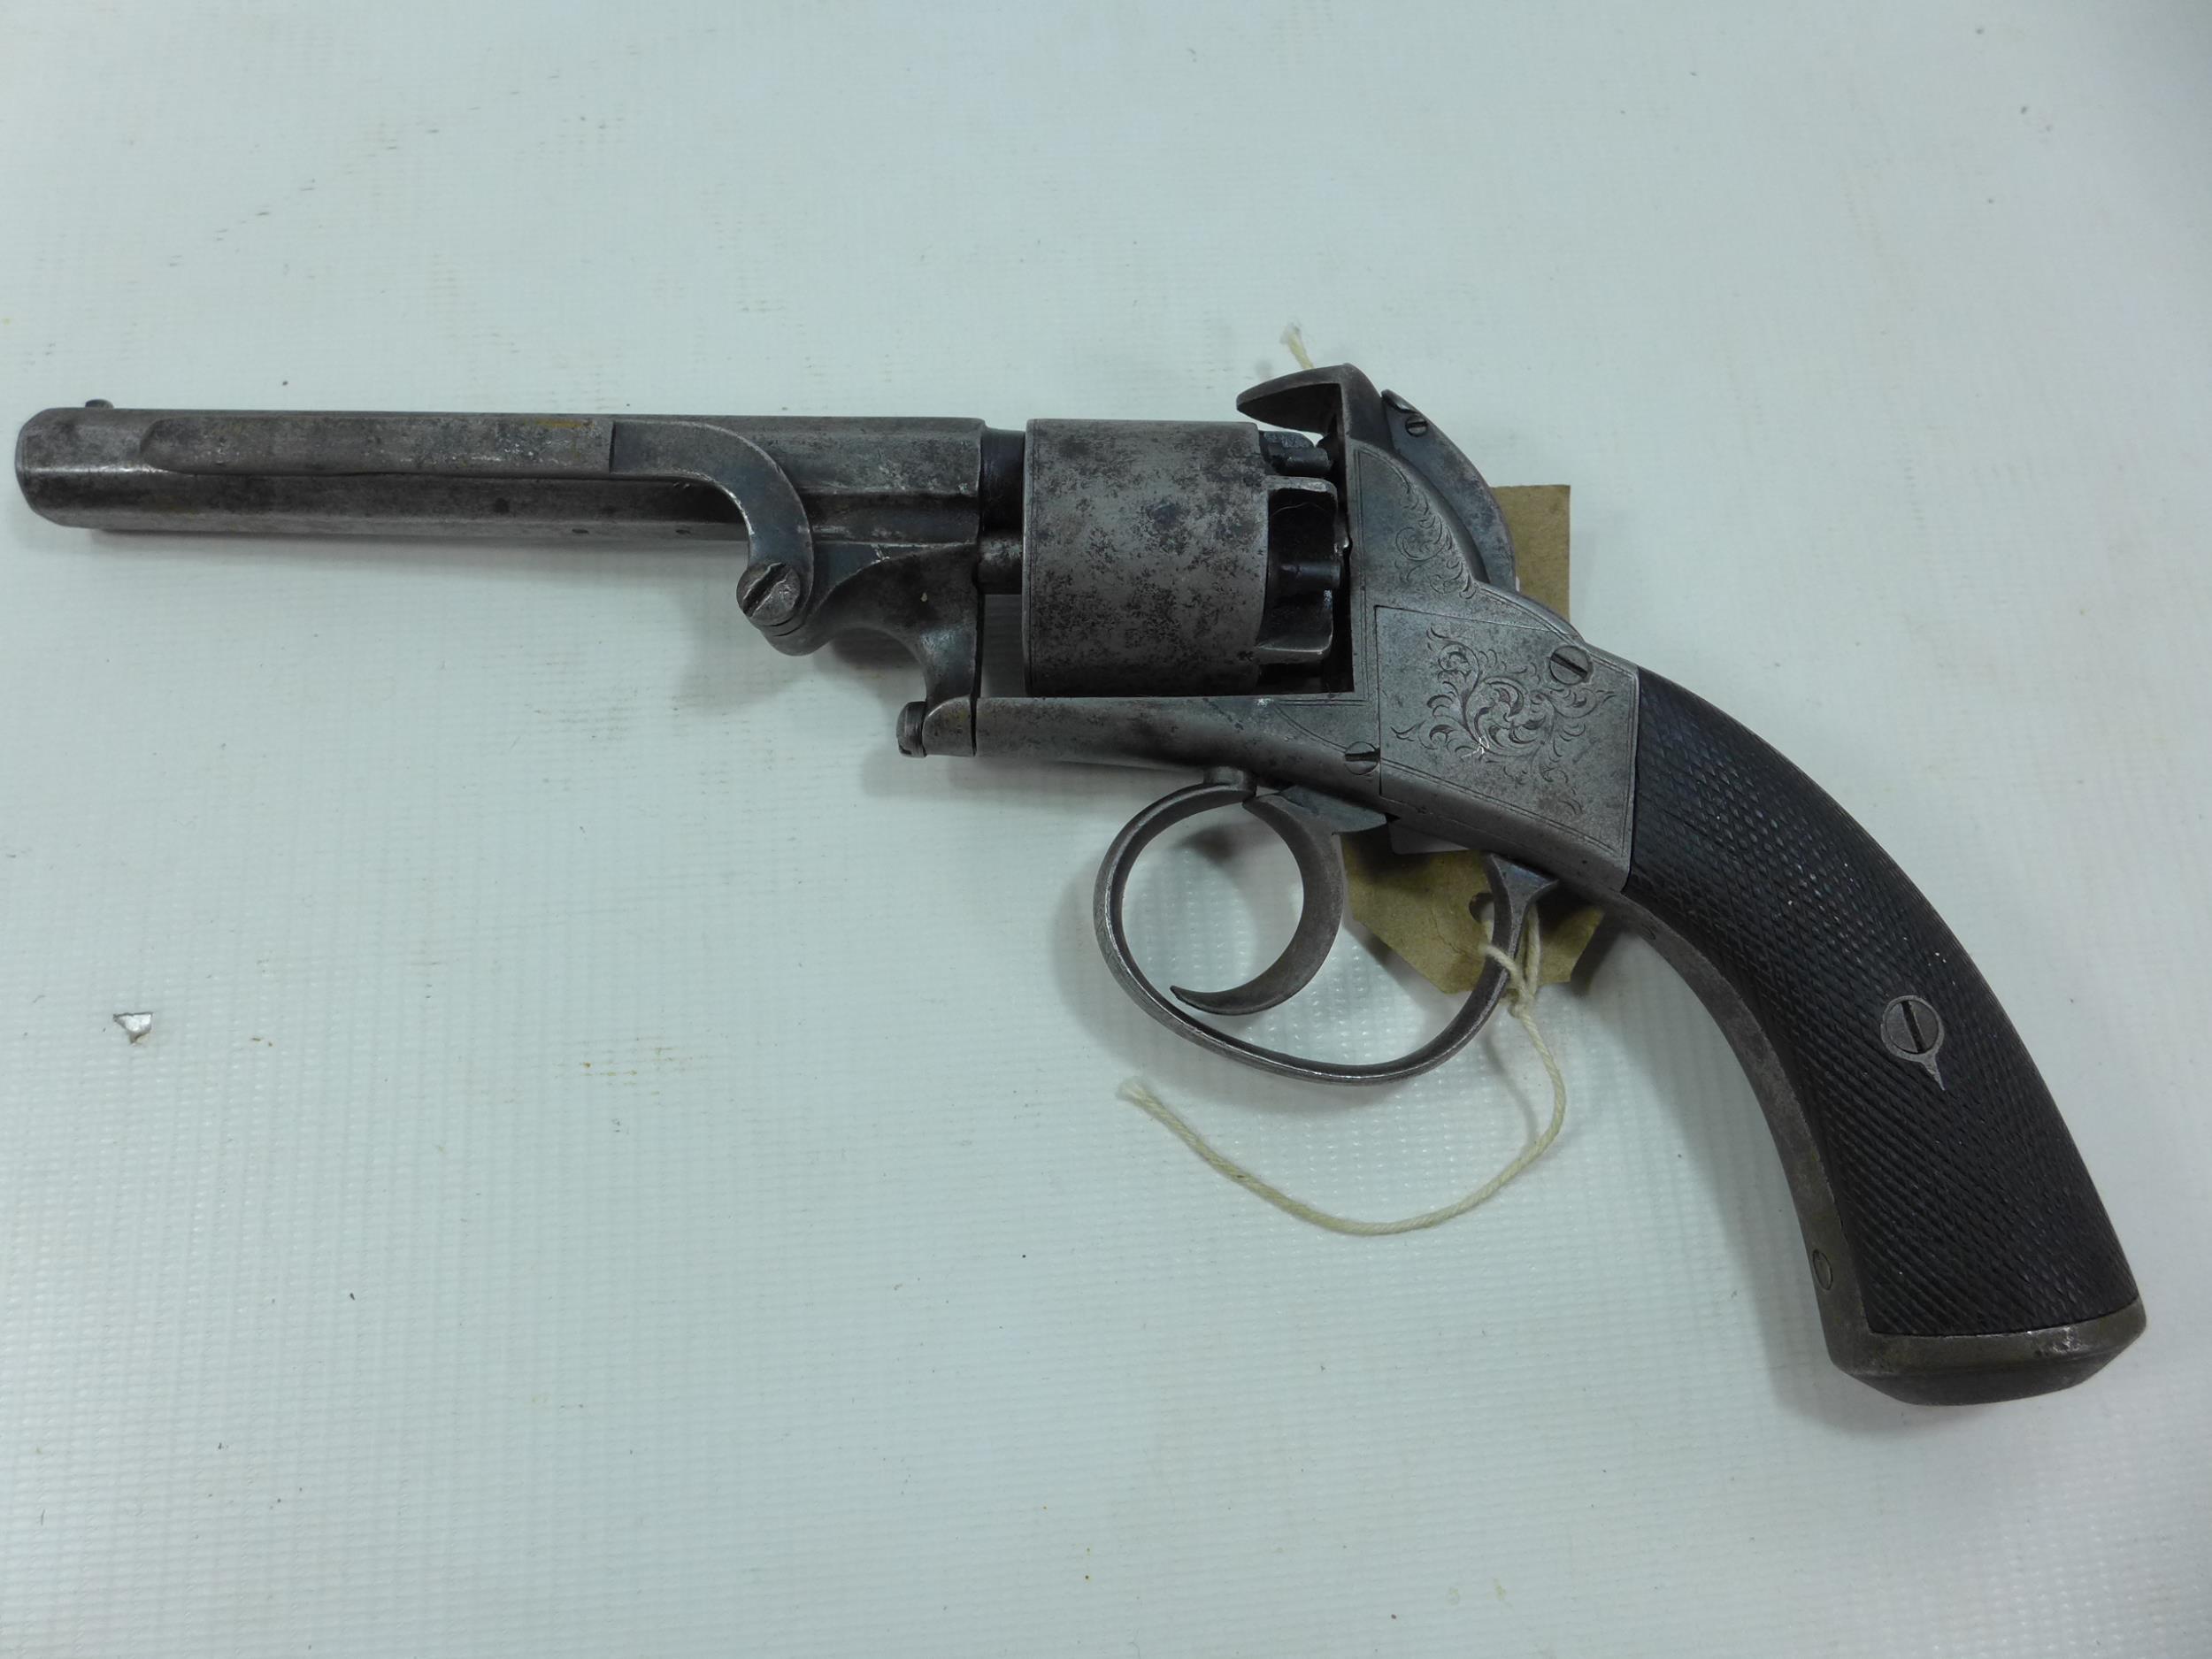 A 19TH CENTURY WEBLEY BENTLEY FIVE SHOT DOUBLE ACTION PERCUSION CAP SPURLESS REVOLVER, 13CM